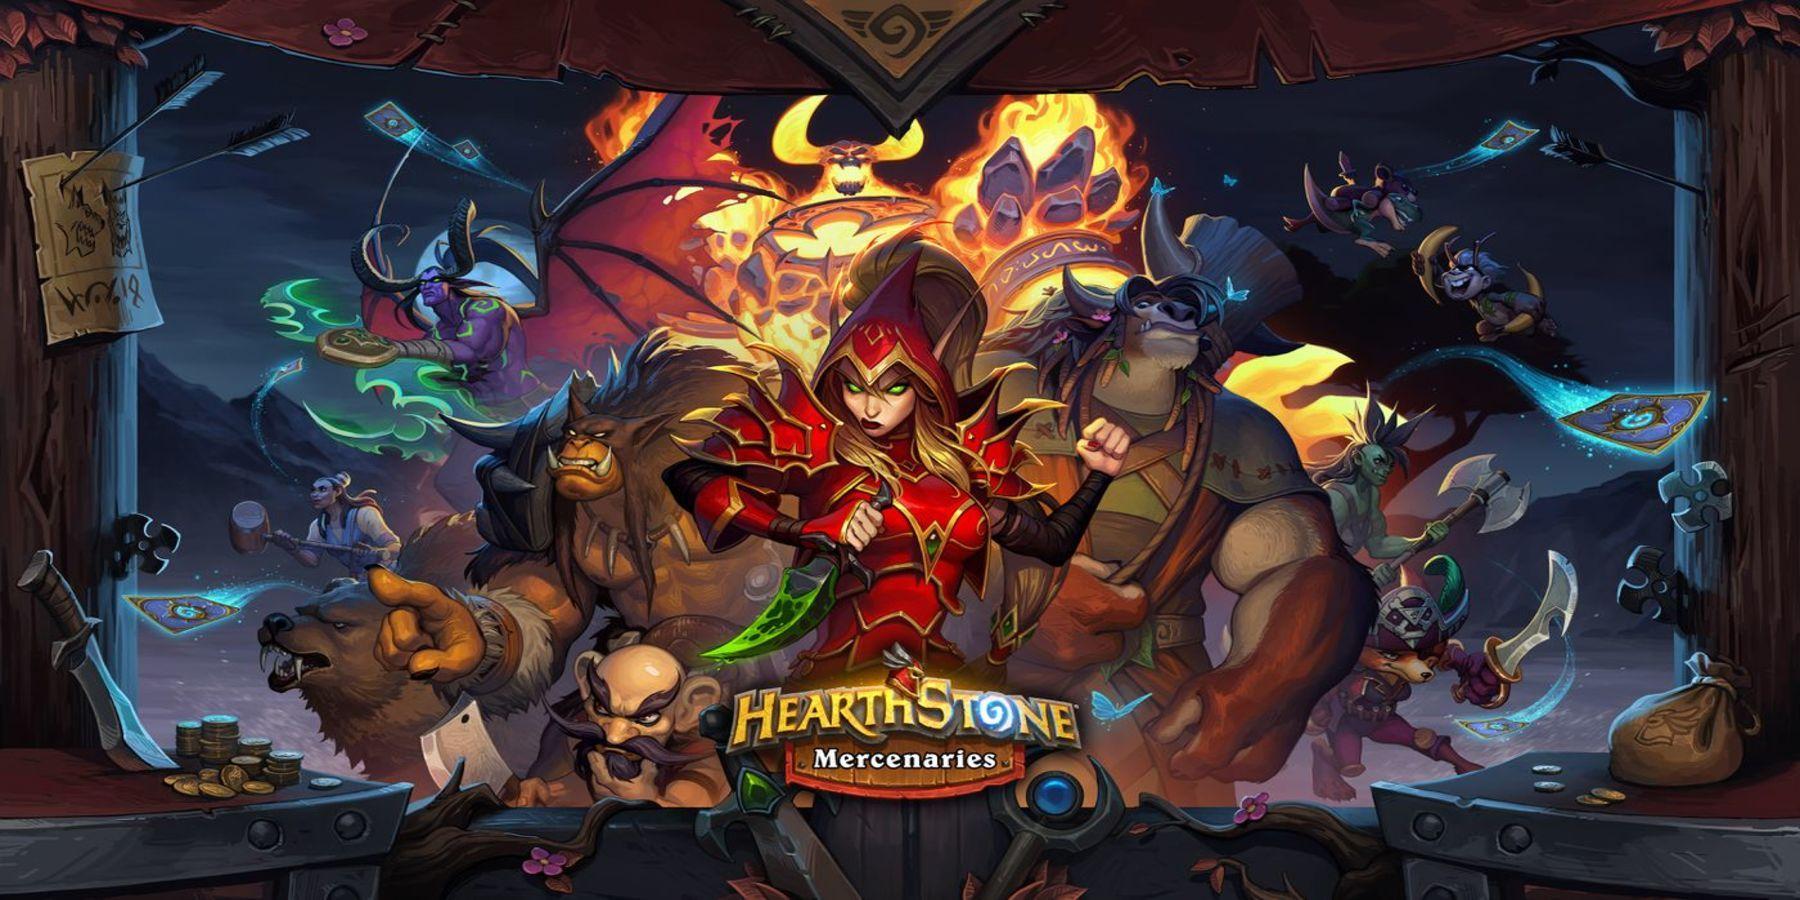 Hearthstone's New Mercenaries Mode Explained